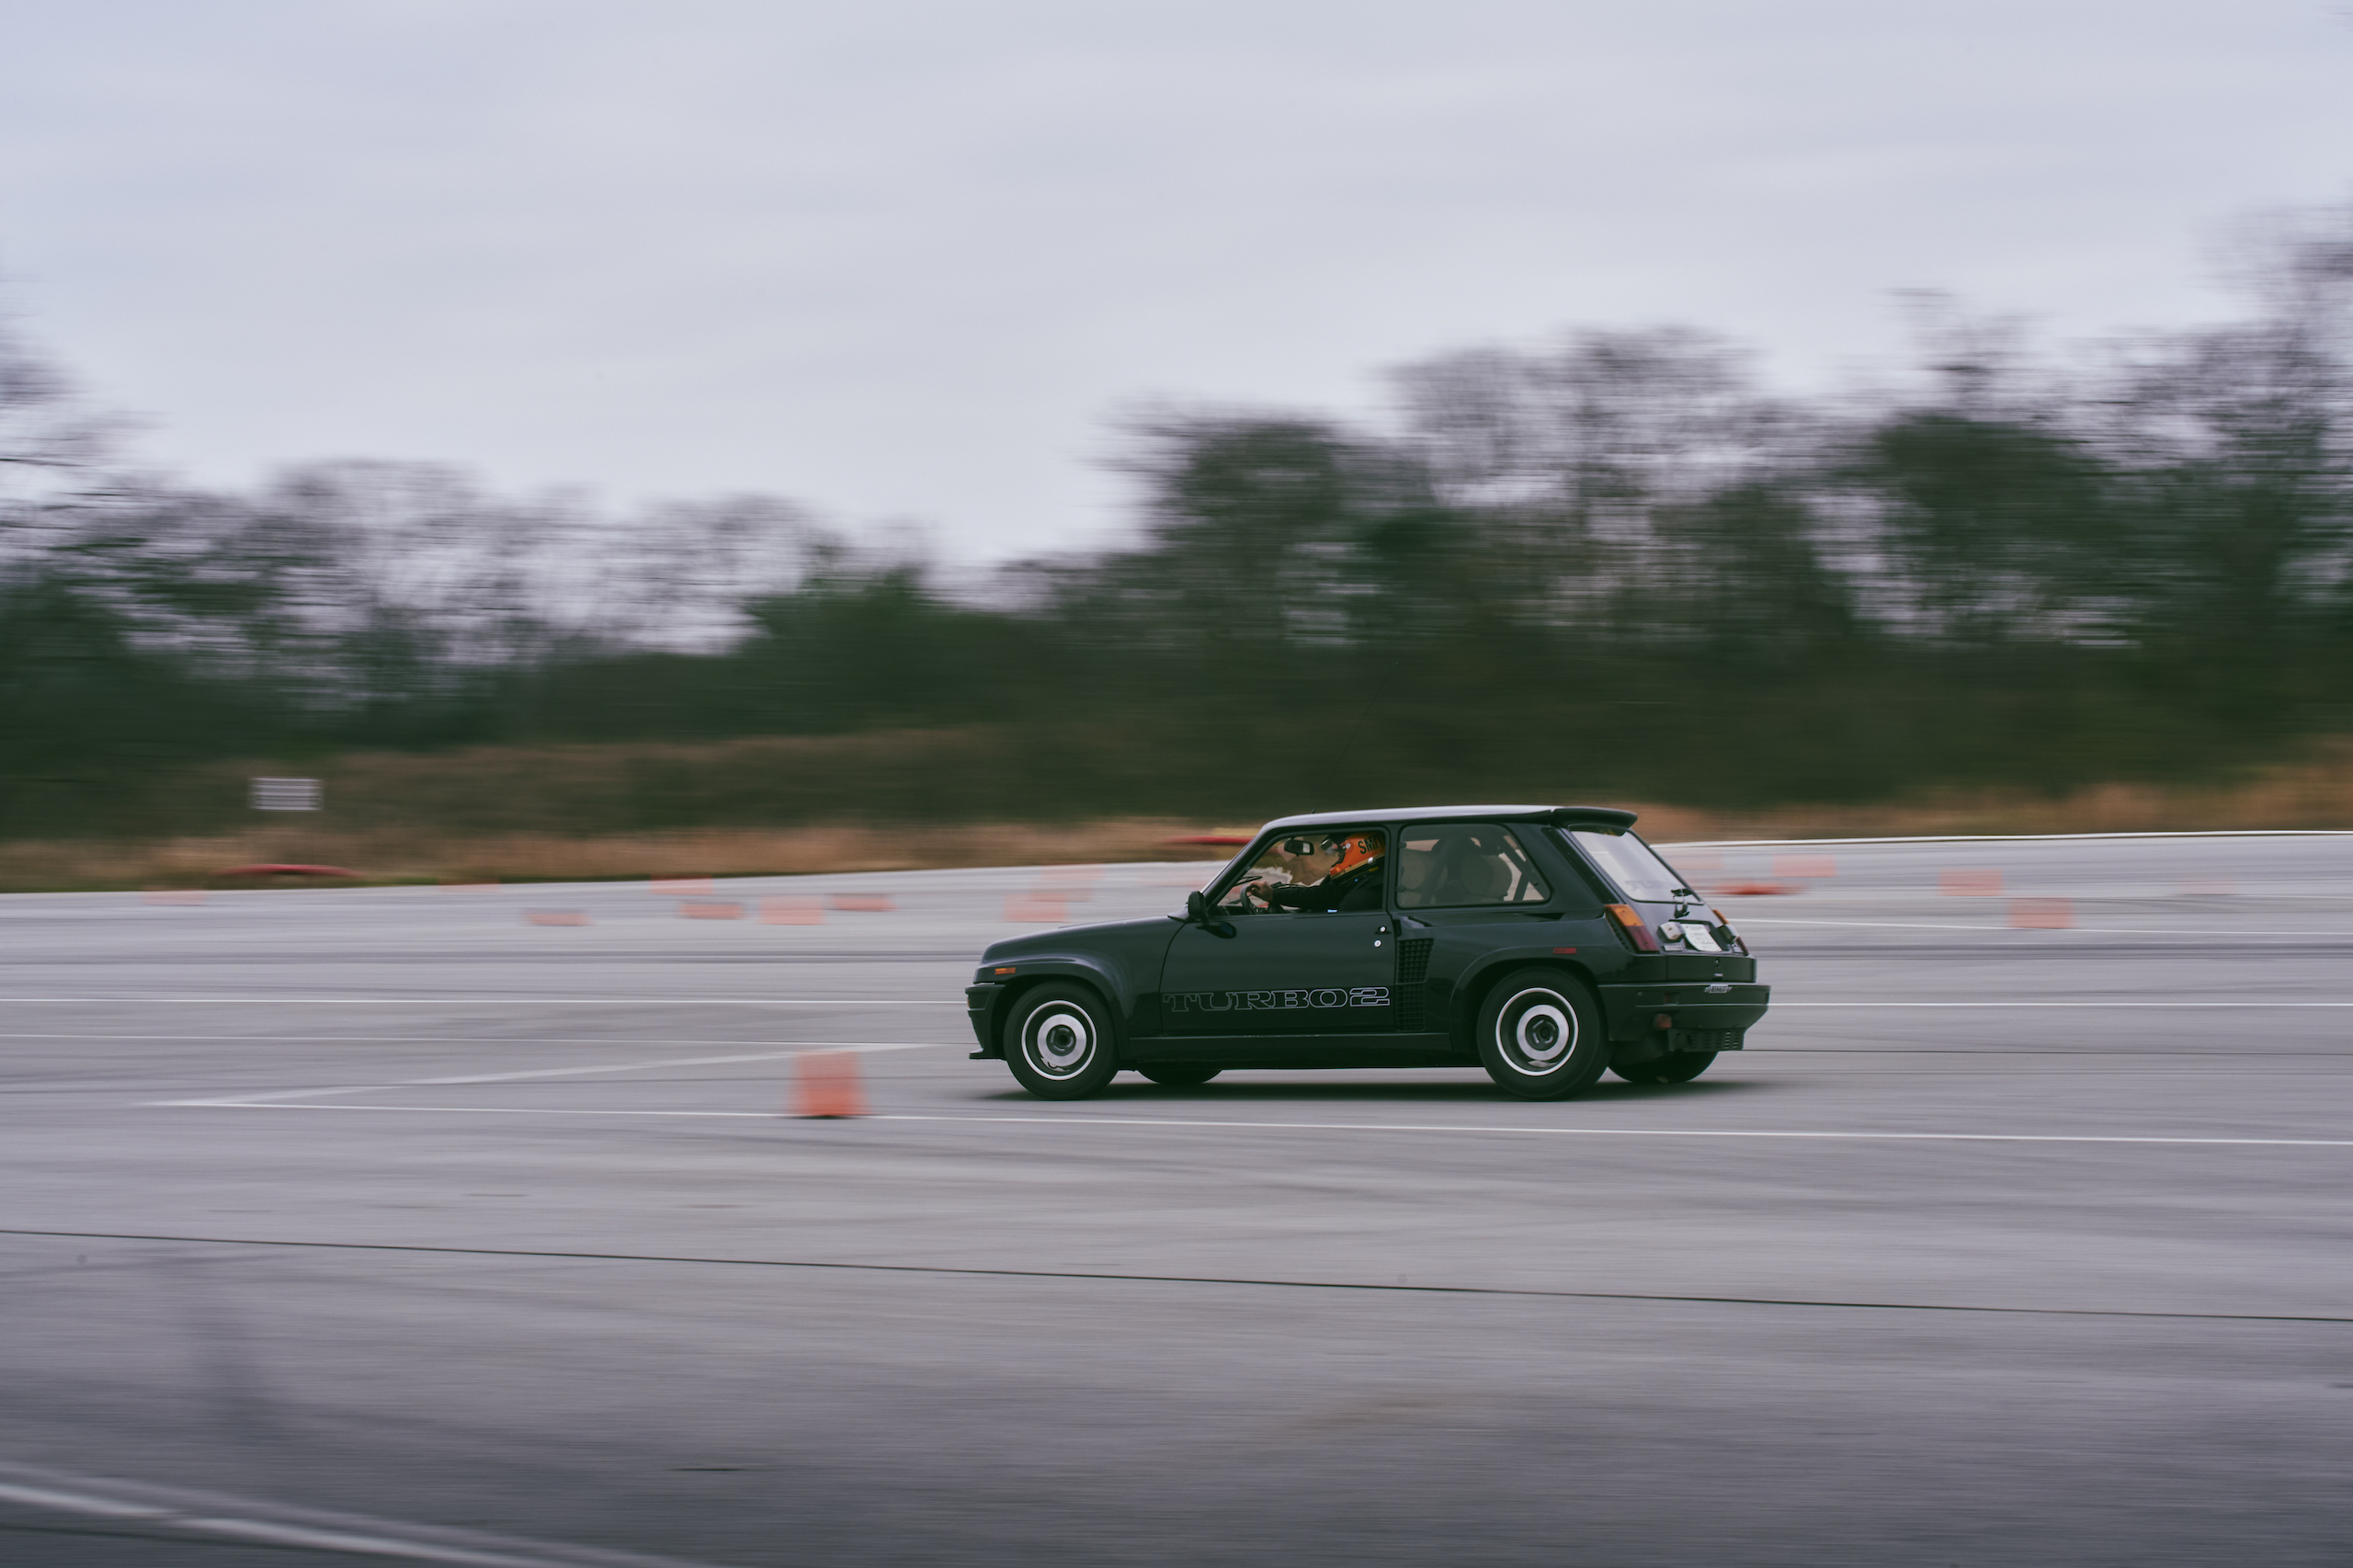 1985 Renault R5 Turbo 2 rear three-quarter track action